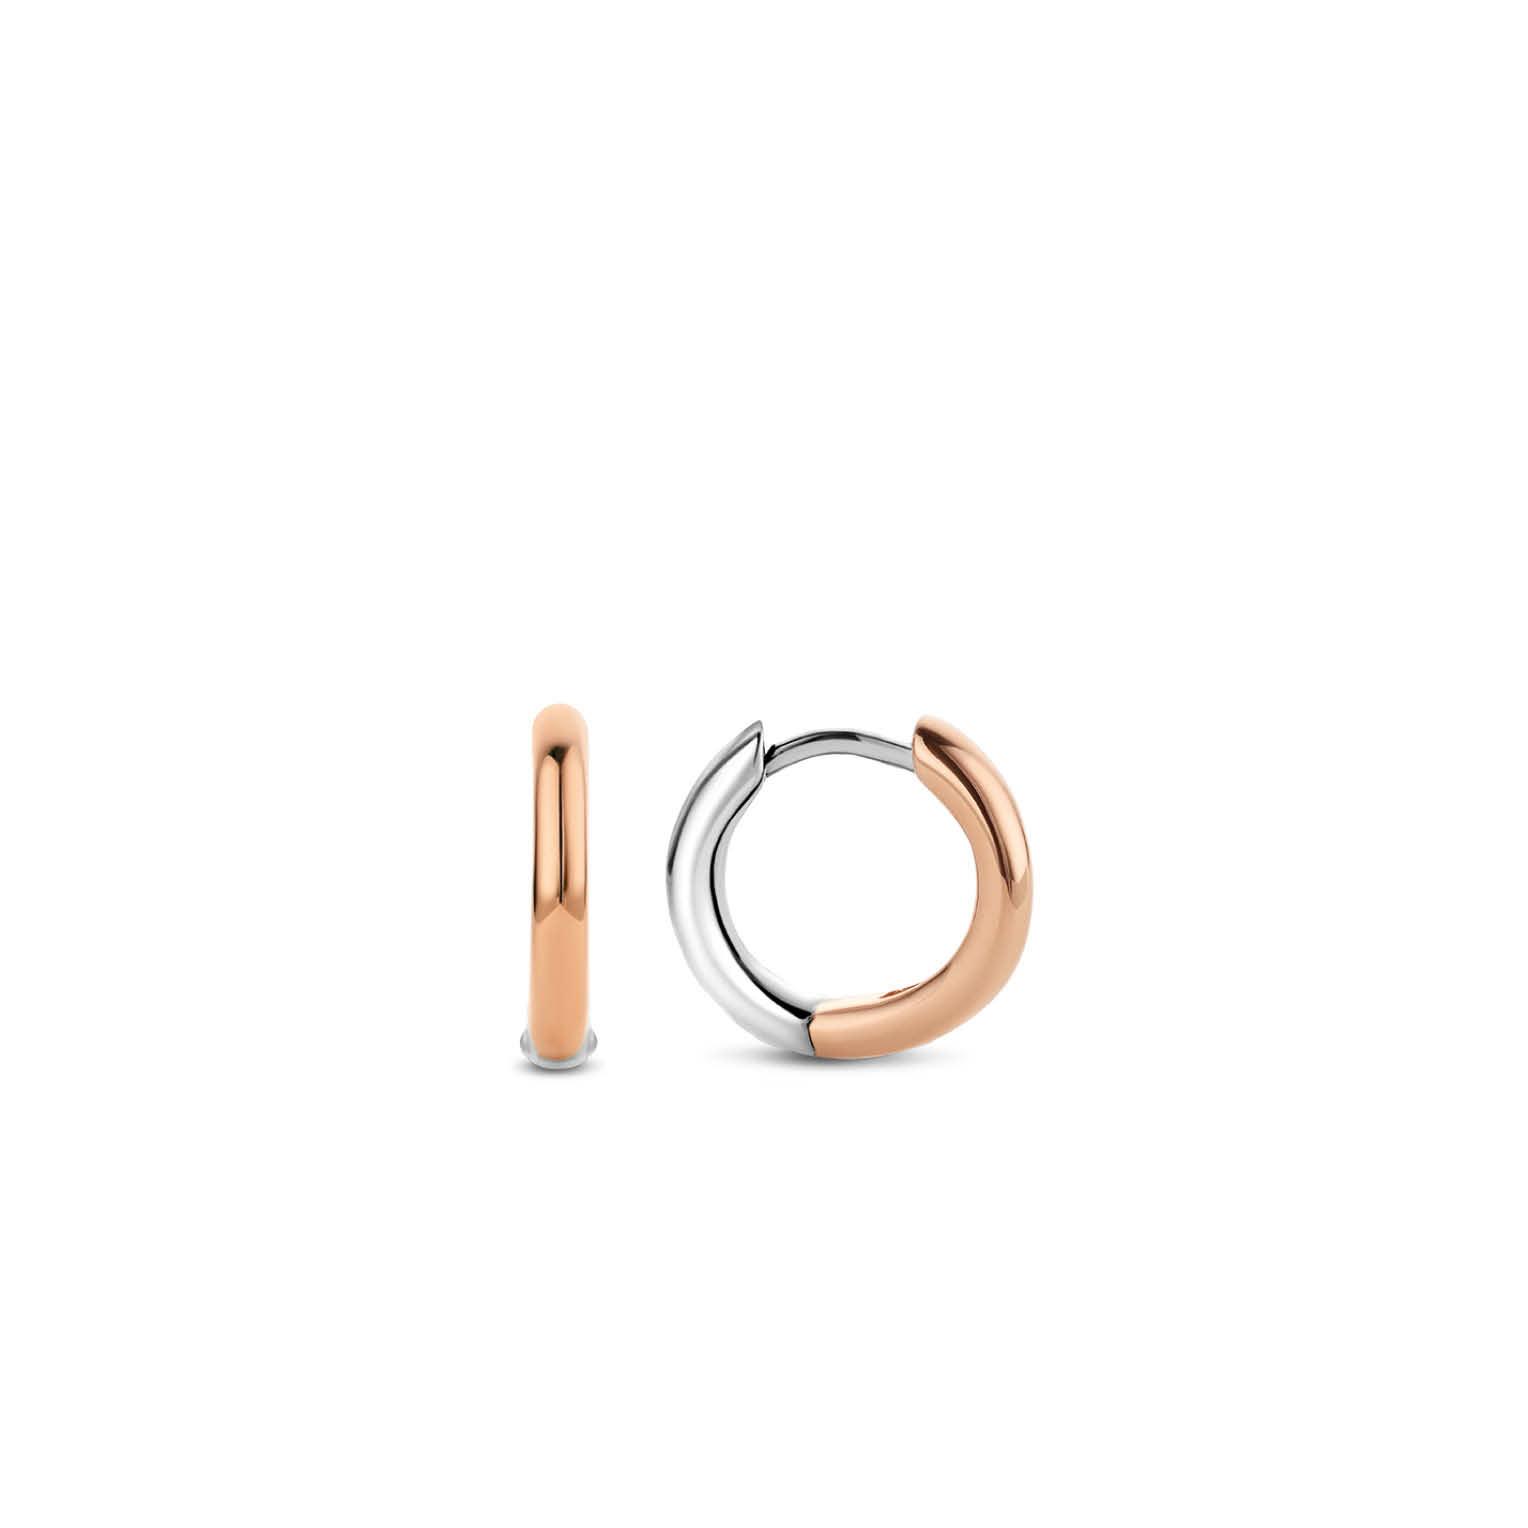 TI SENTO - Milano Earrings 7812SR-4